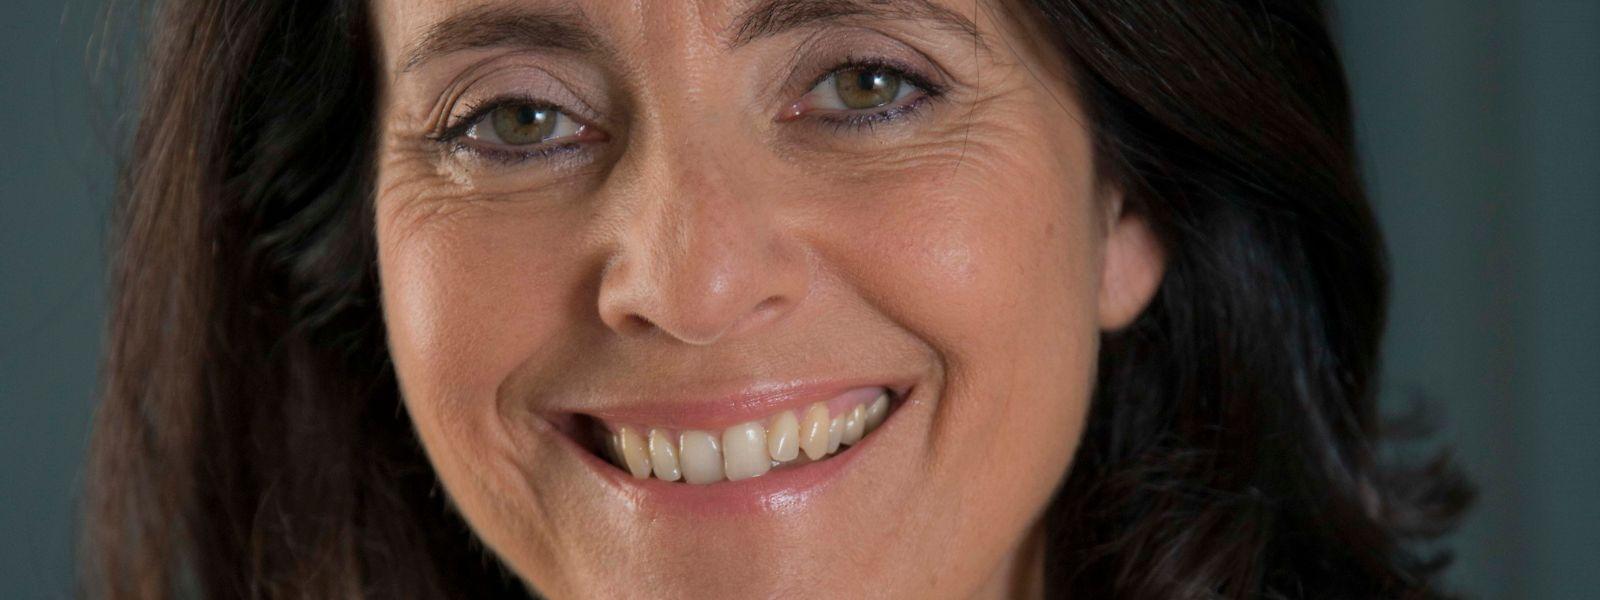 Béatrice Belorgey übernimmt Luxemburgs größte Bank.